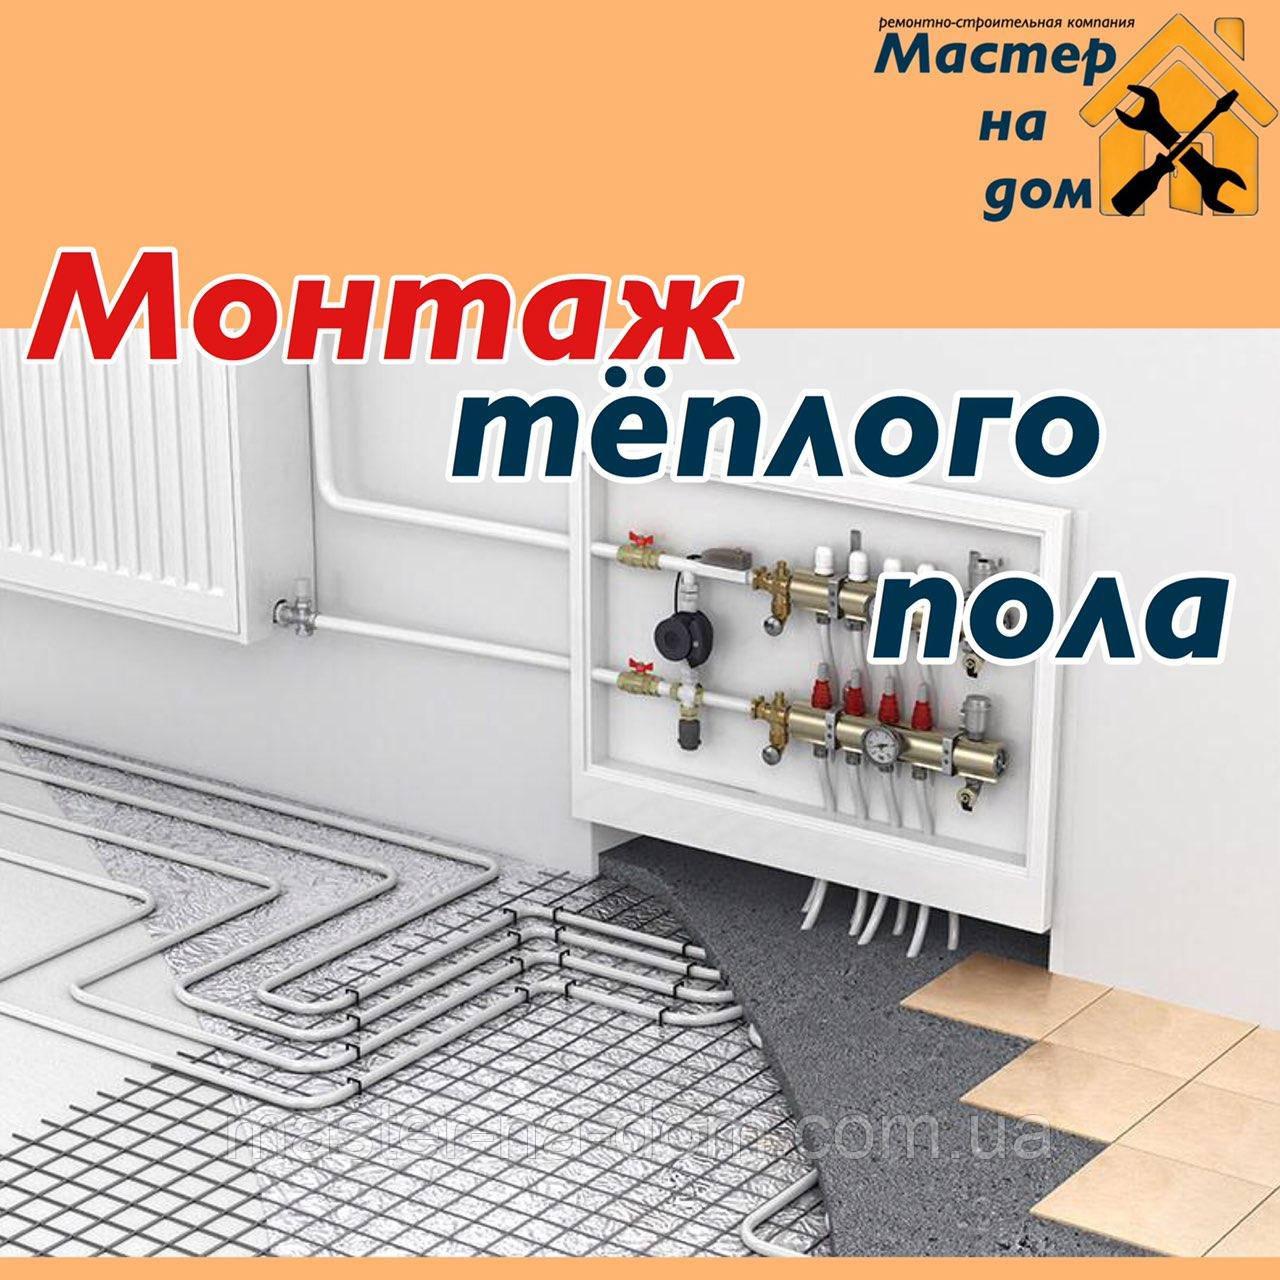 Монтаж теплого пола в Кропивницком